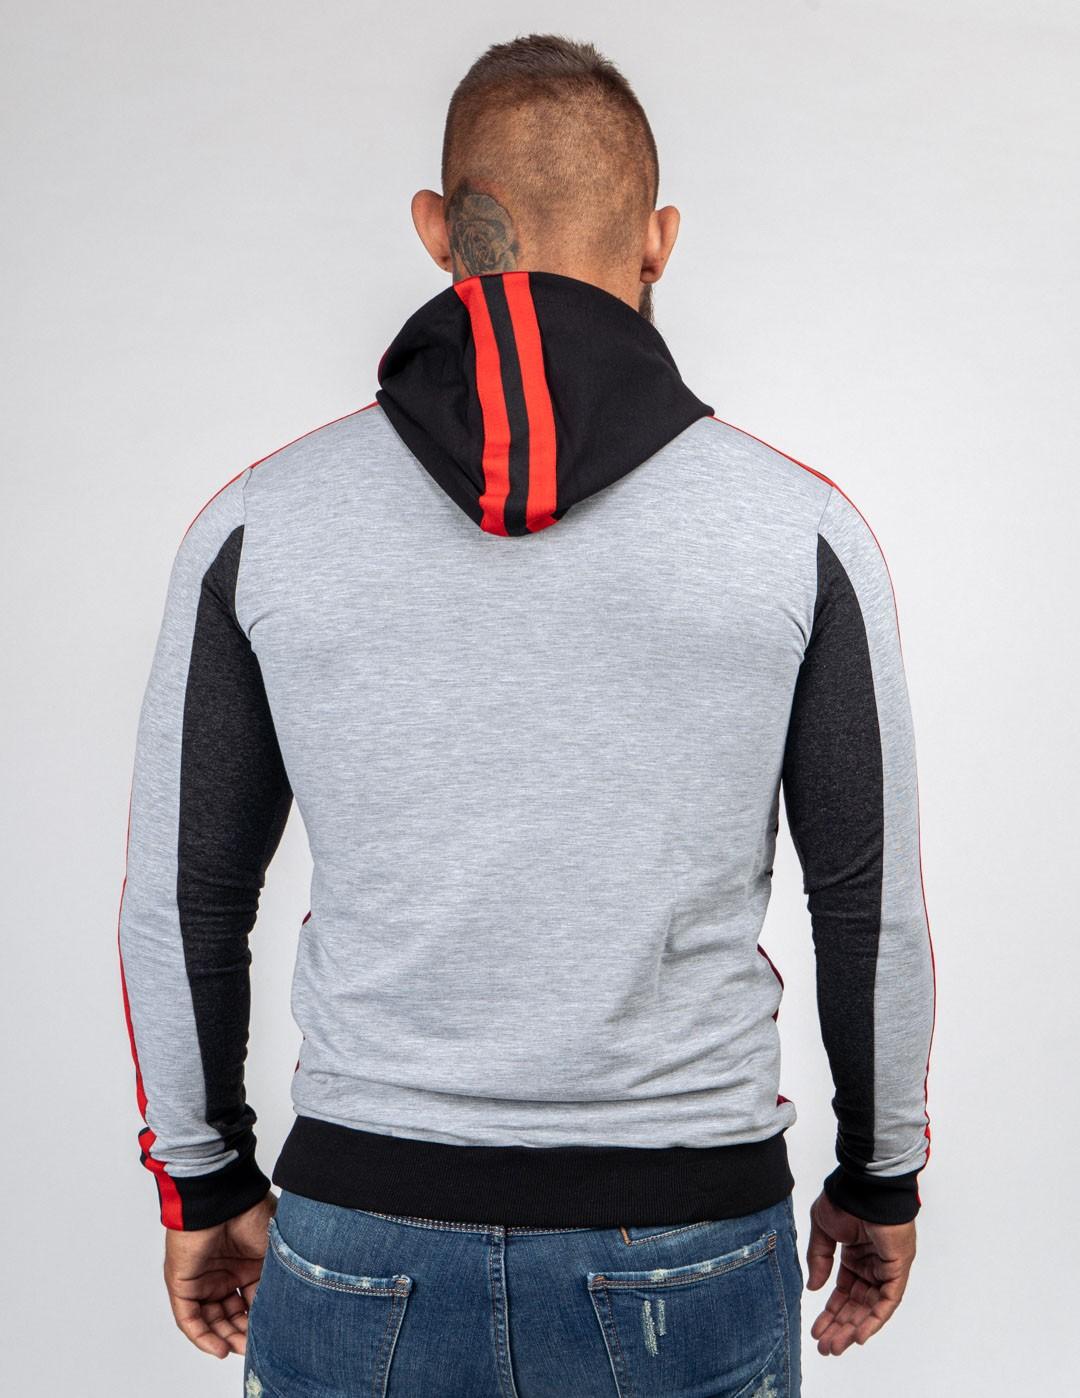 Sweatshirt OUTSTANDING Light Grey/Bordeaux